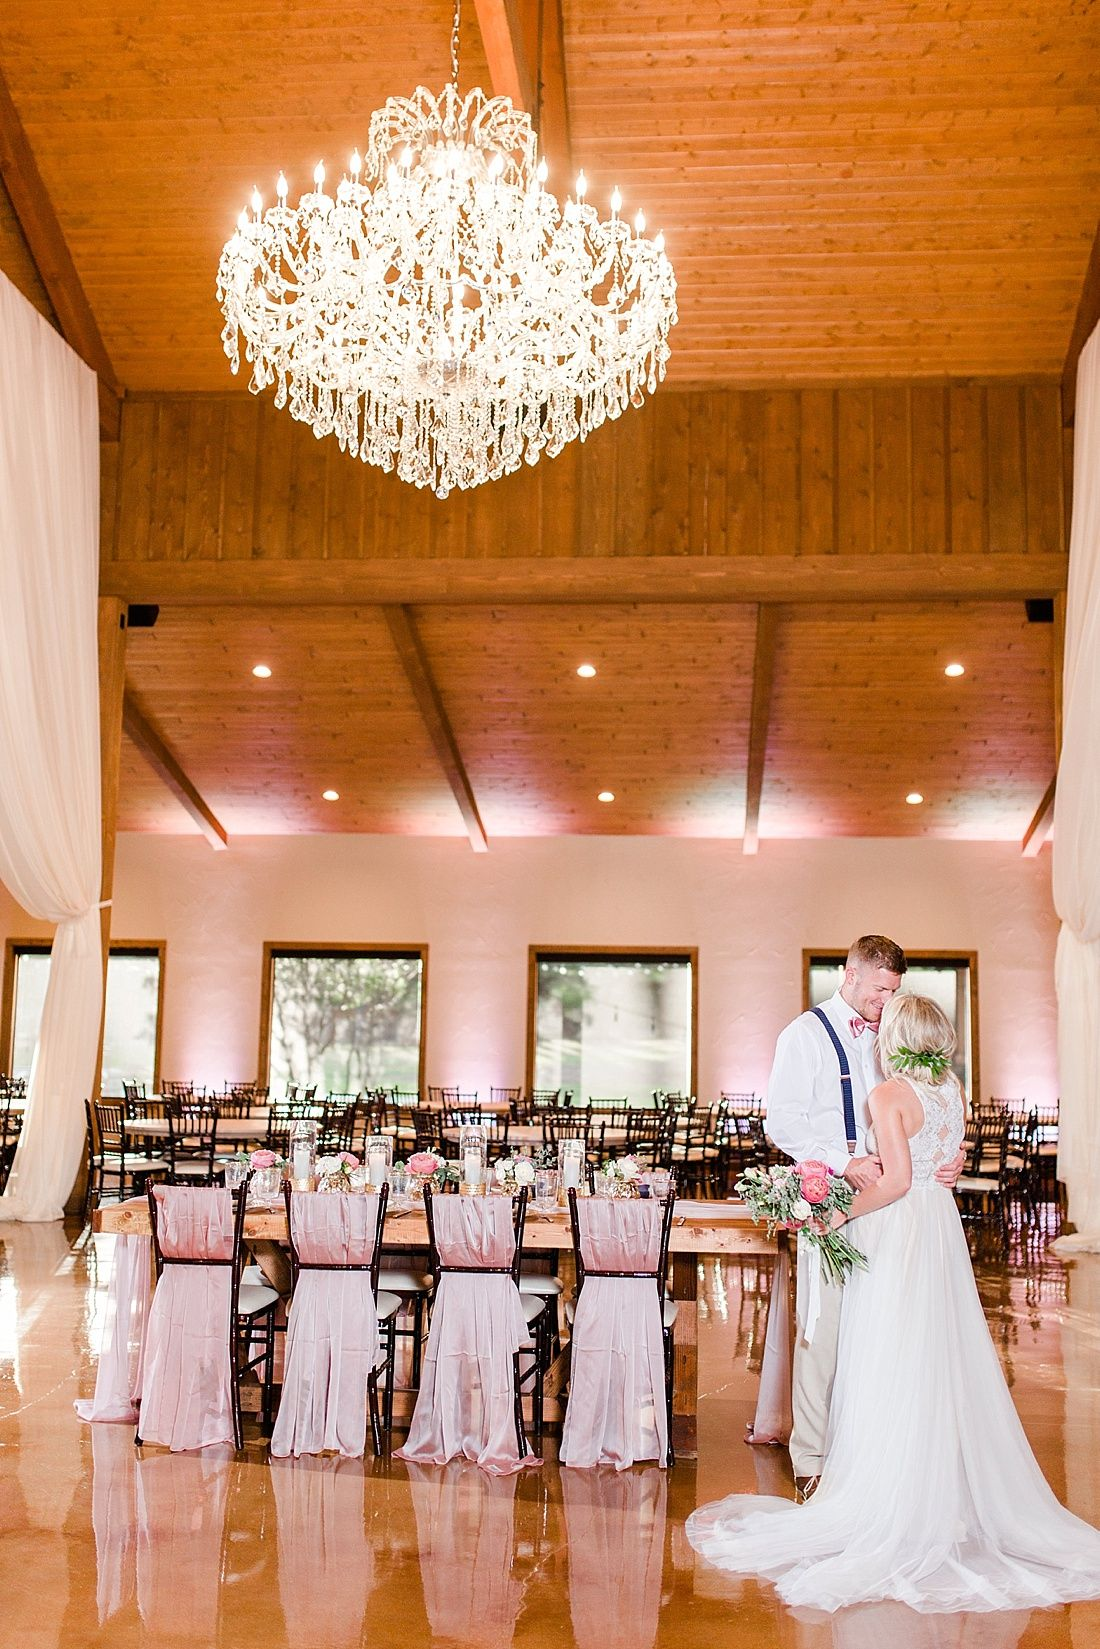 The Chandelier Of Gruene Wedding Venue In New Braunfels Texas